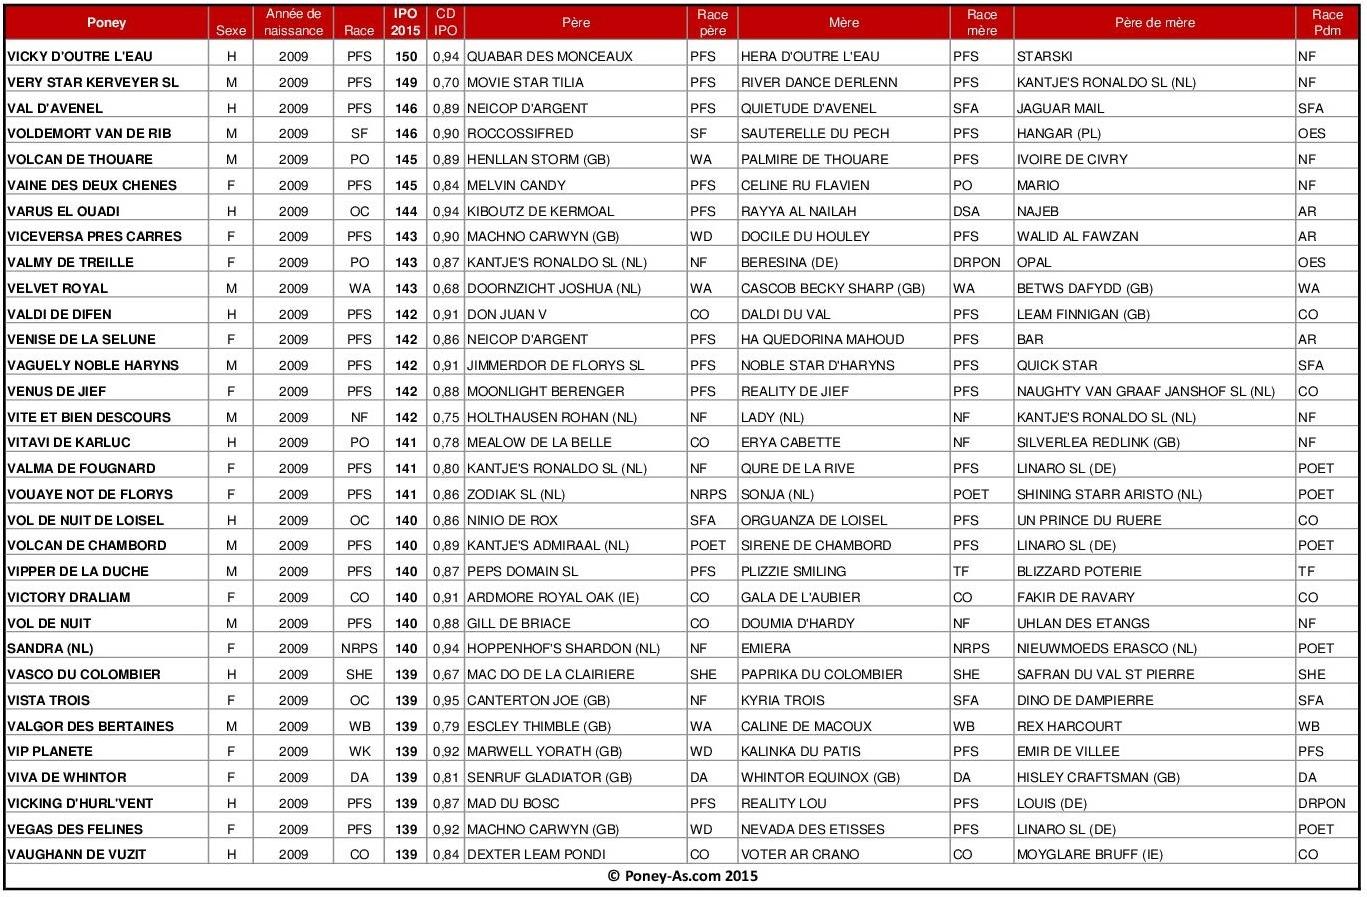 Meilleurs IPO 2015 chez les poneys de 6 ans - Poney-As.com